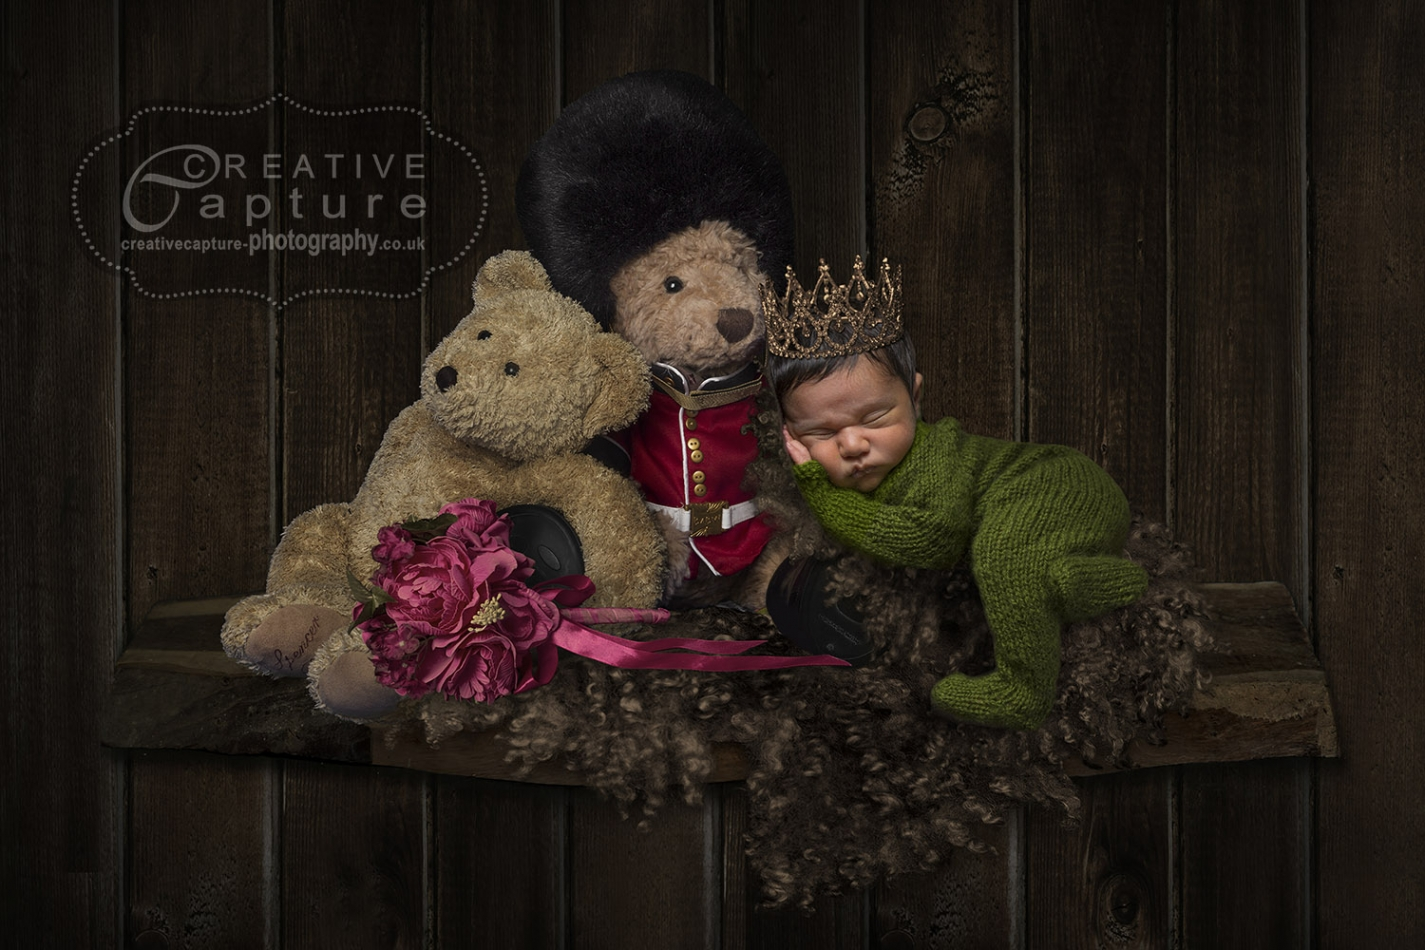 Queens-guard-rustic-wood-shelf-flowers-1-done